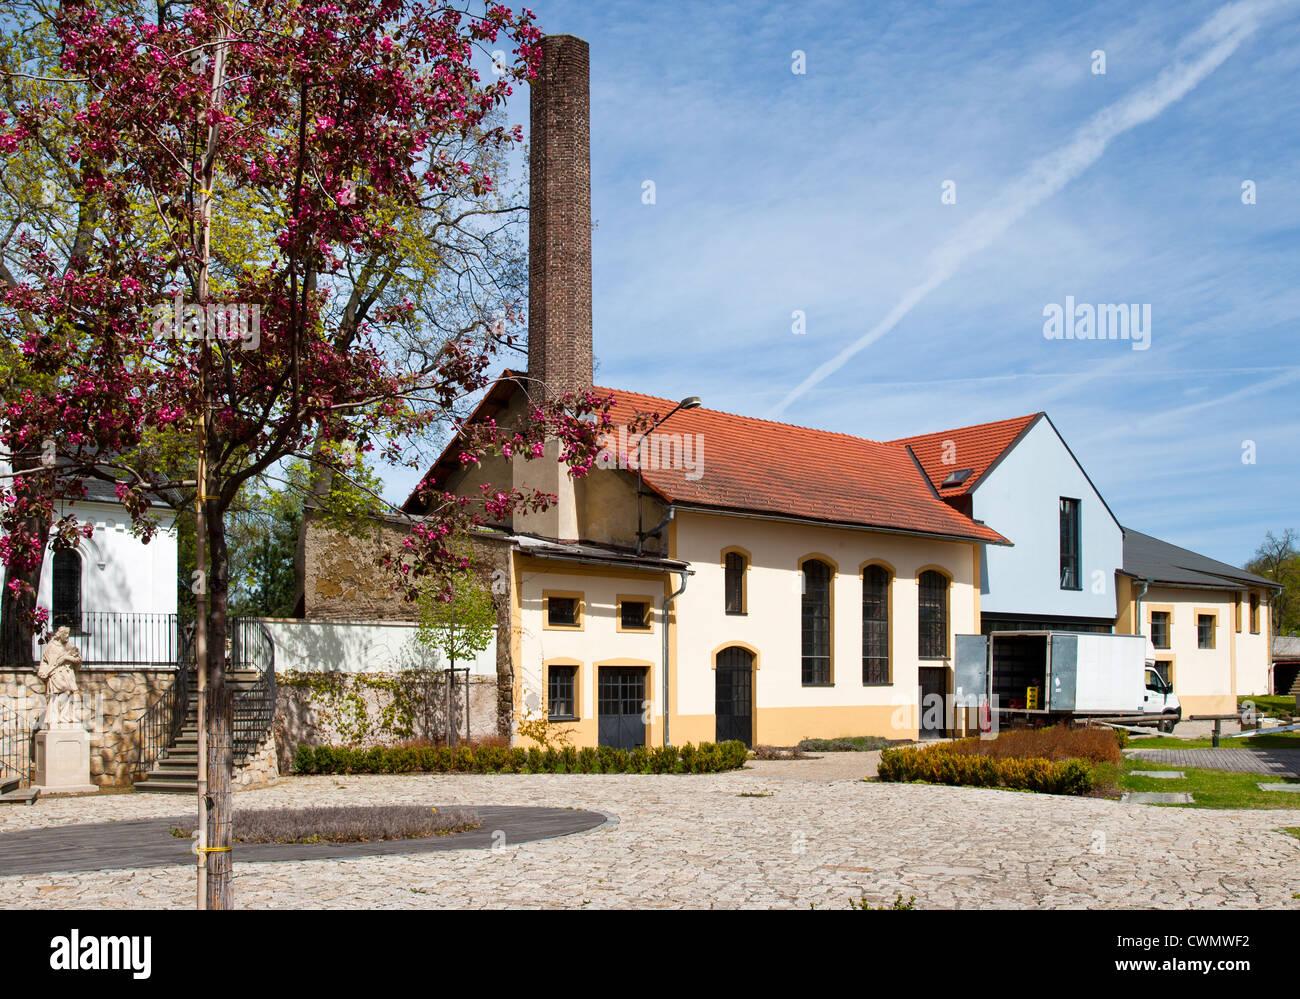 Pocernicky pivovar, Zamecky park, Dolni Pocernice, Praha, Ceska republika Stock Photo